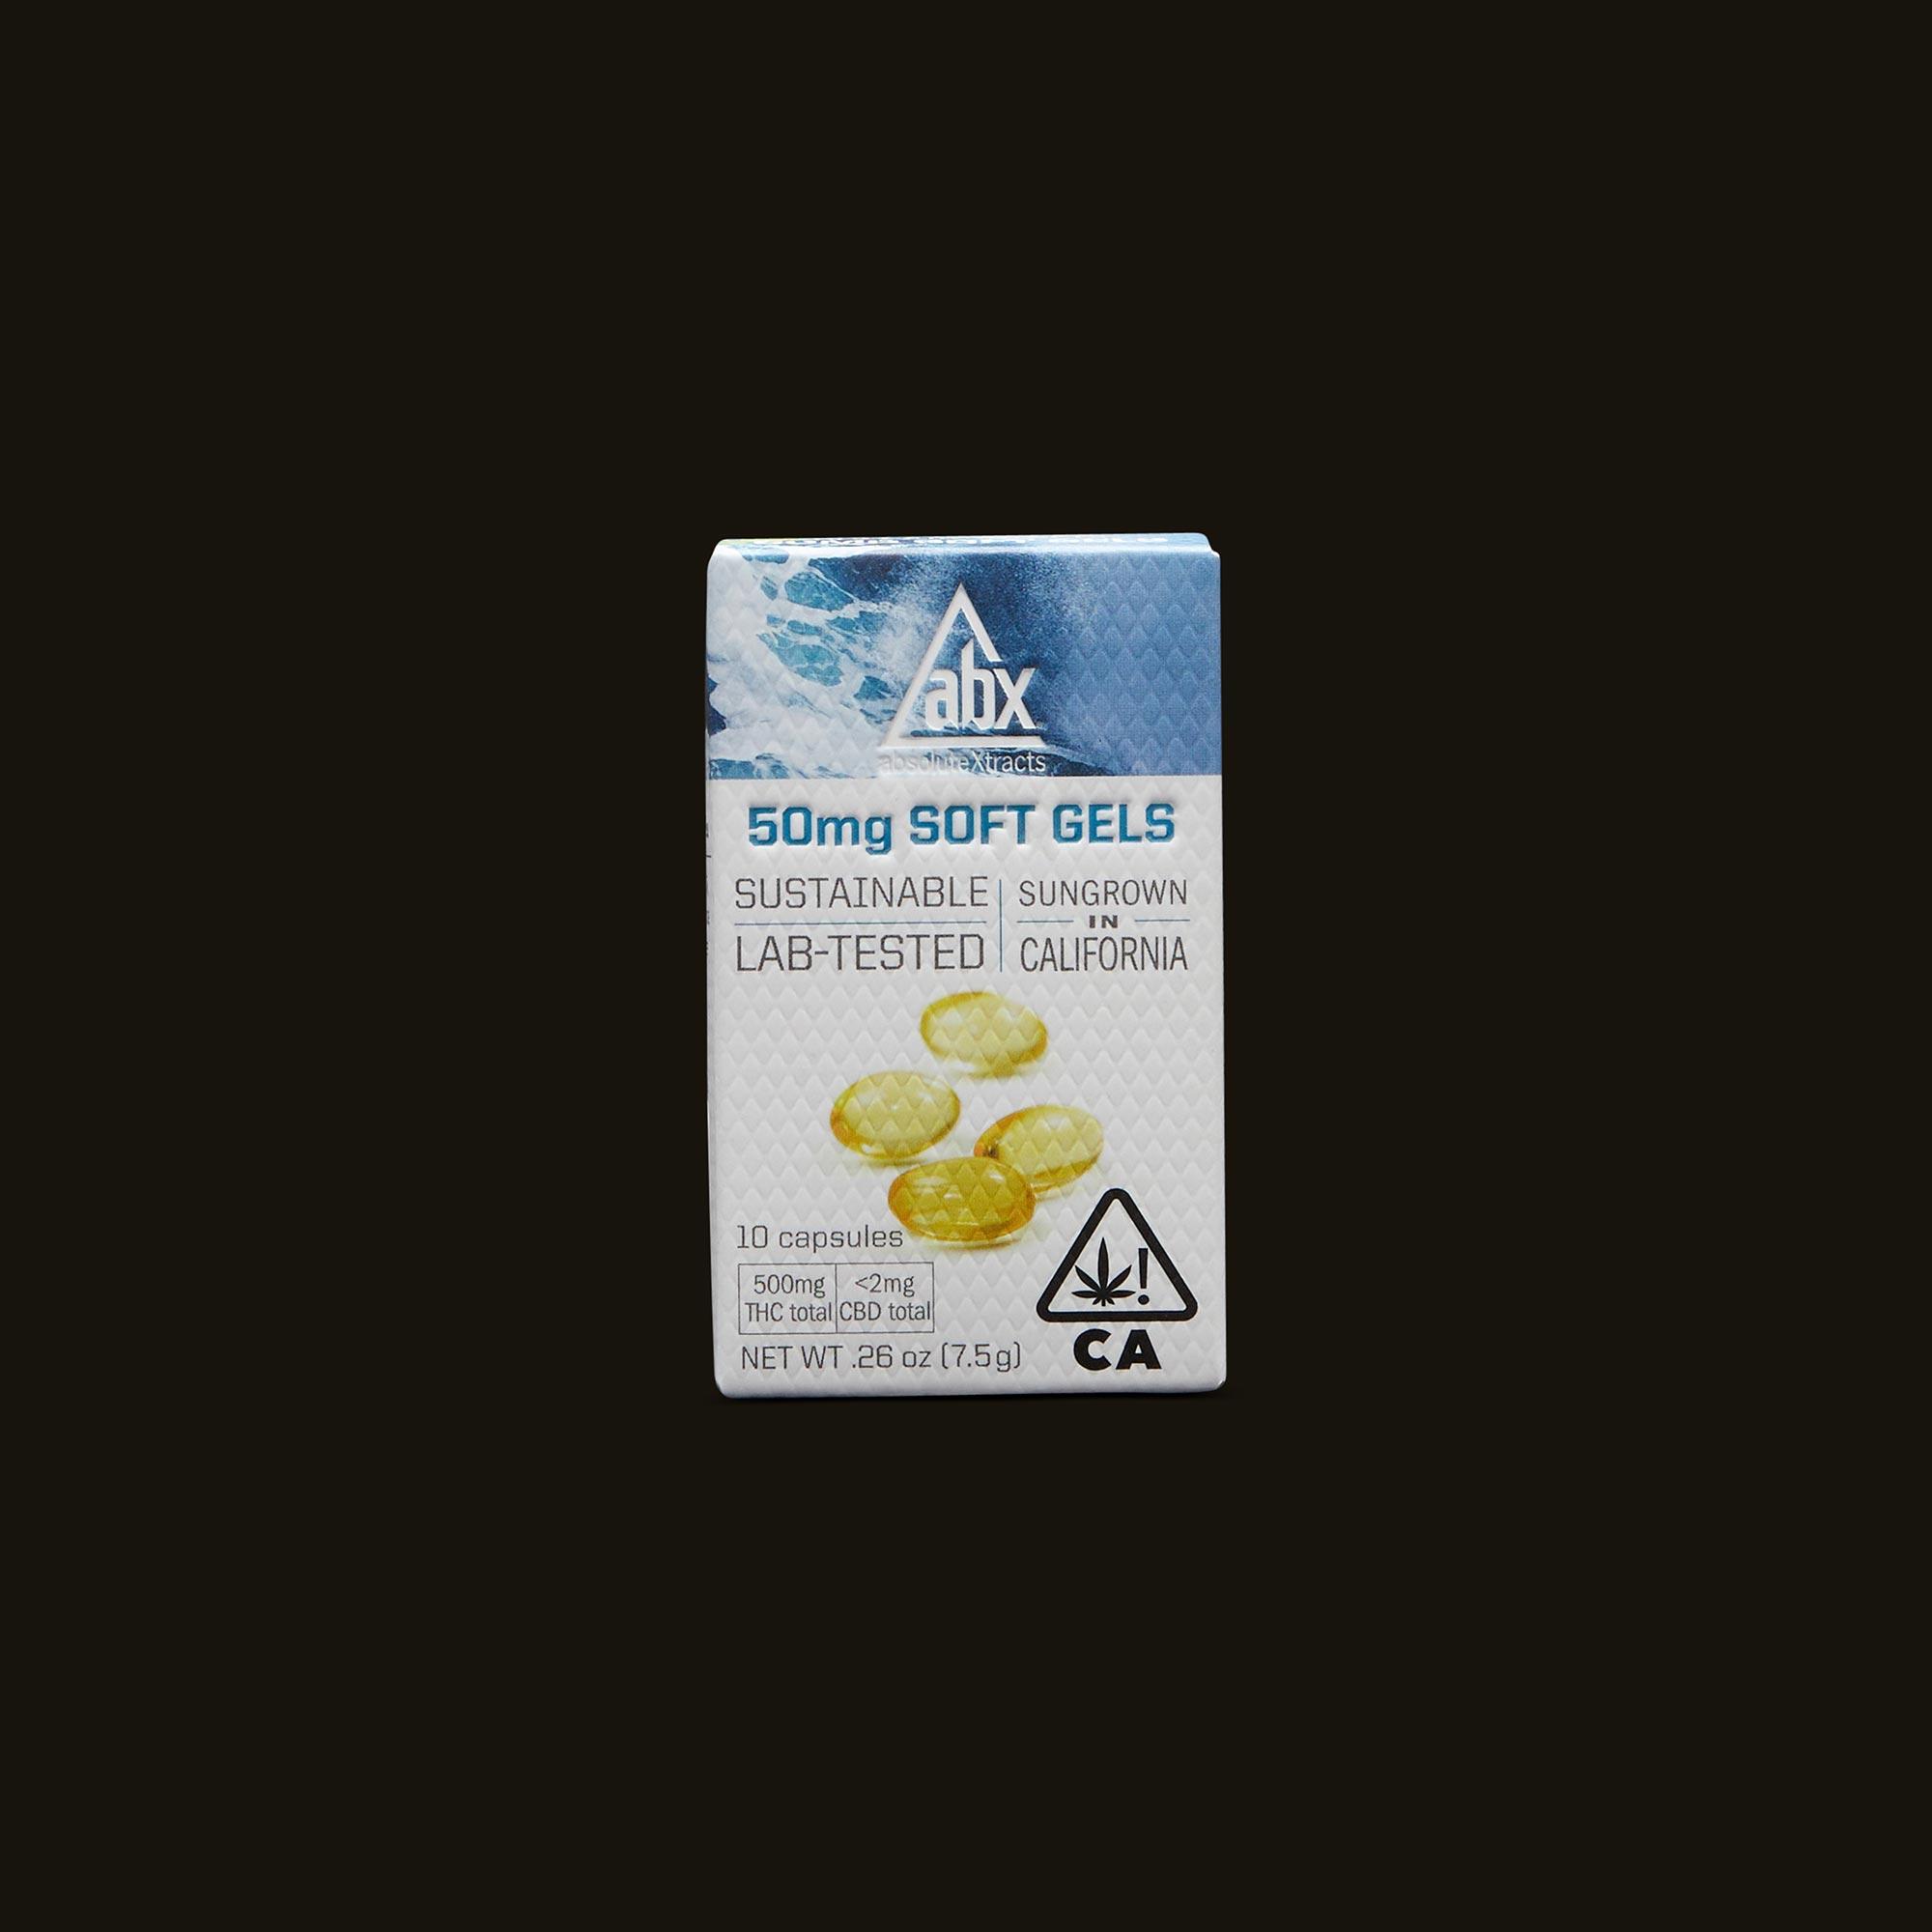 Box of 50mg Soft Gel THC capsules